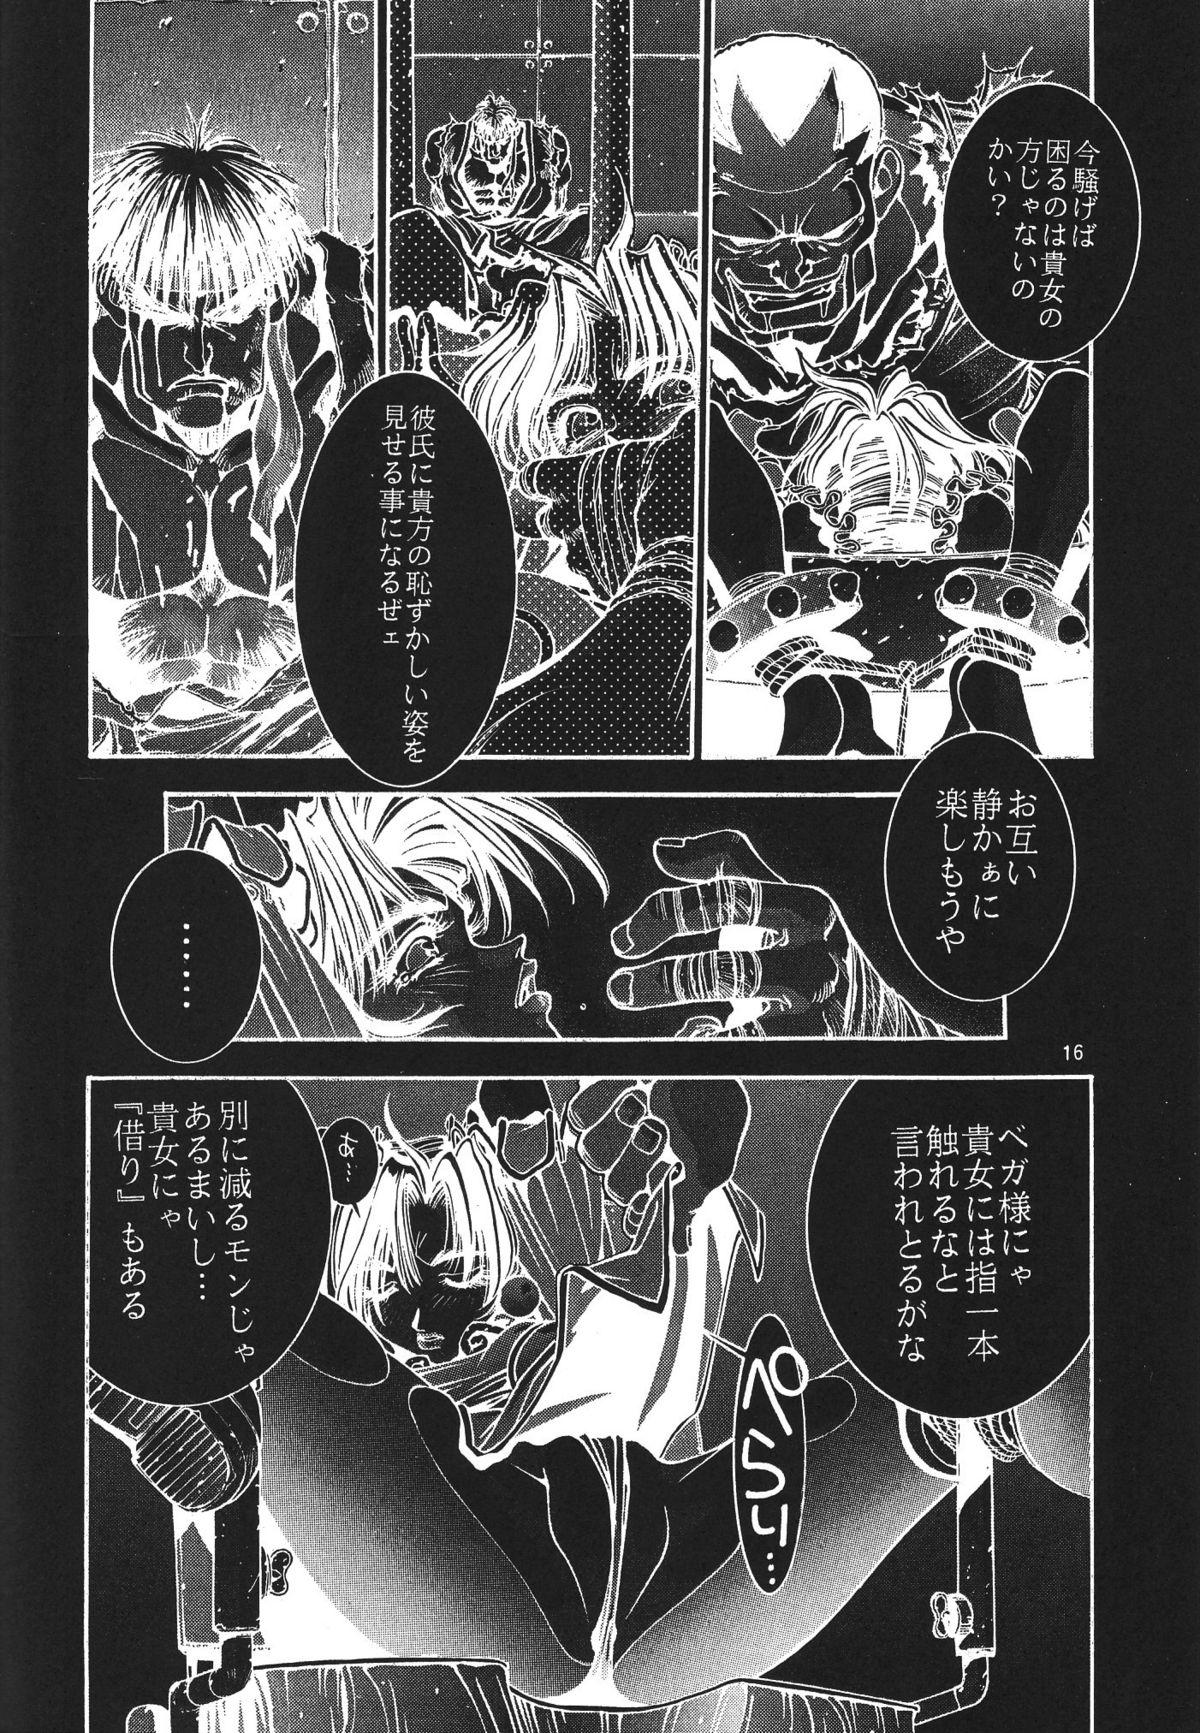 Kakutou Complete Gekan 16